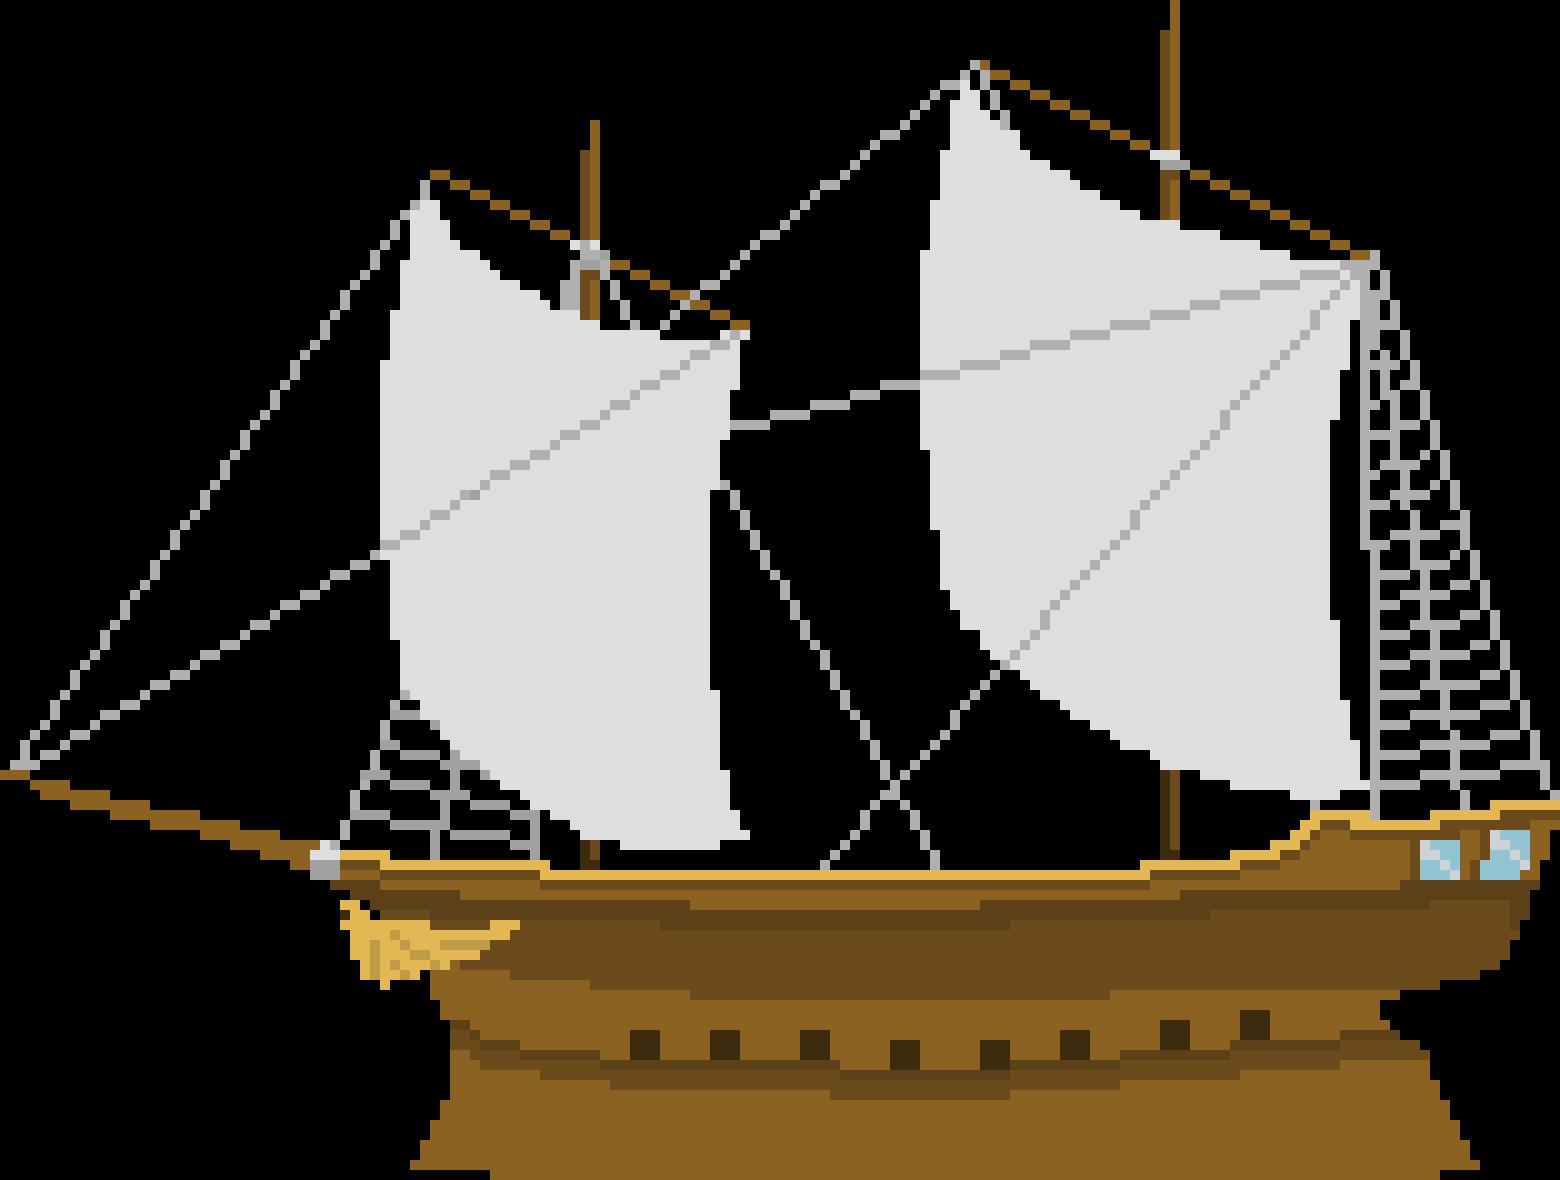 Pirateship Pixel Art Maker